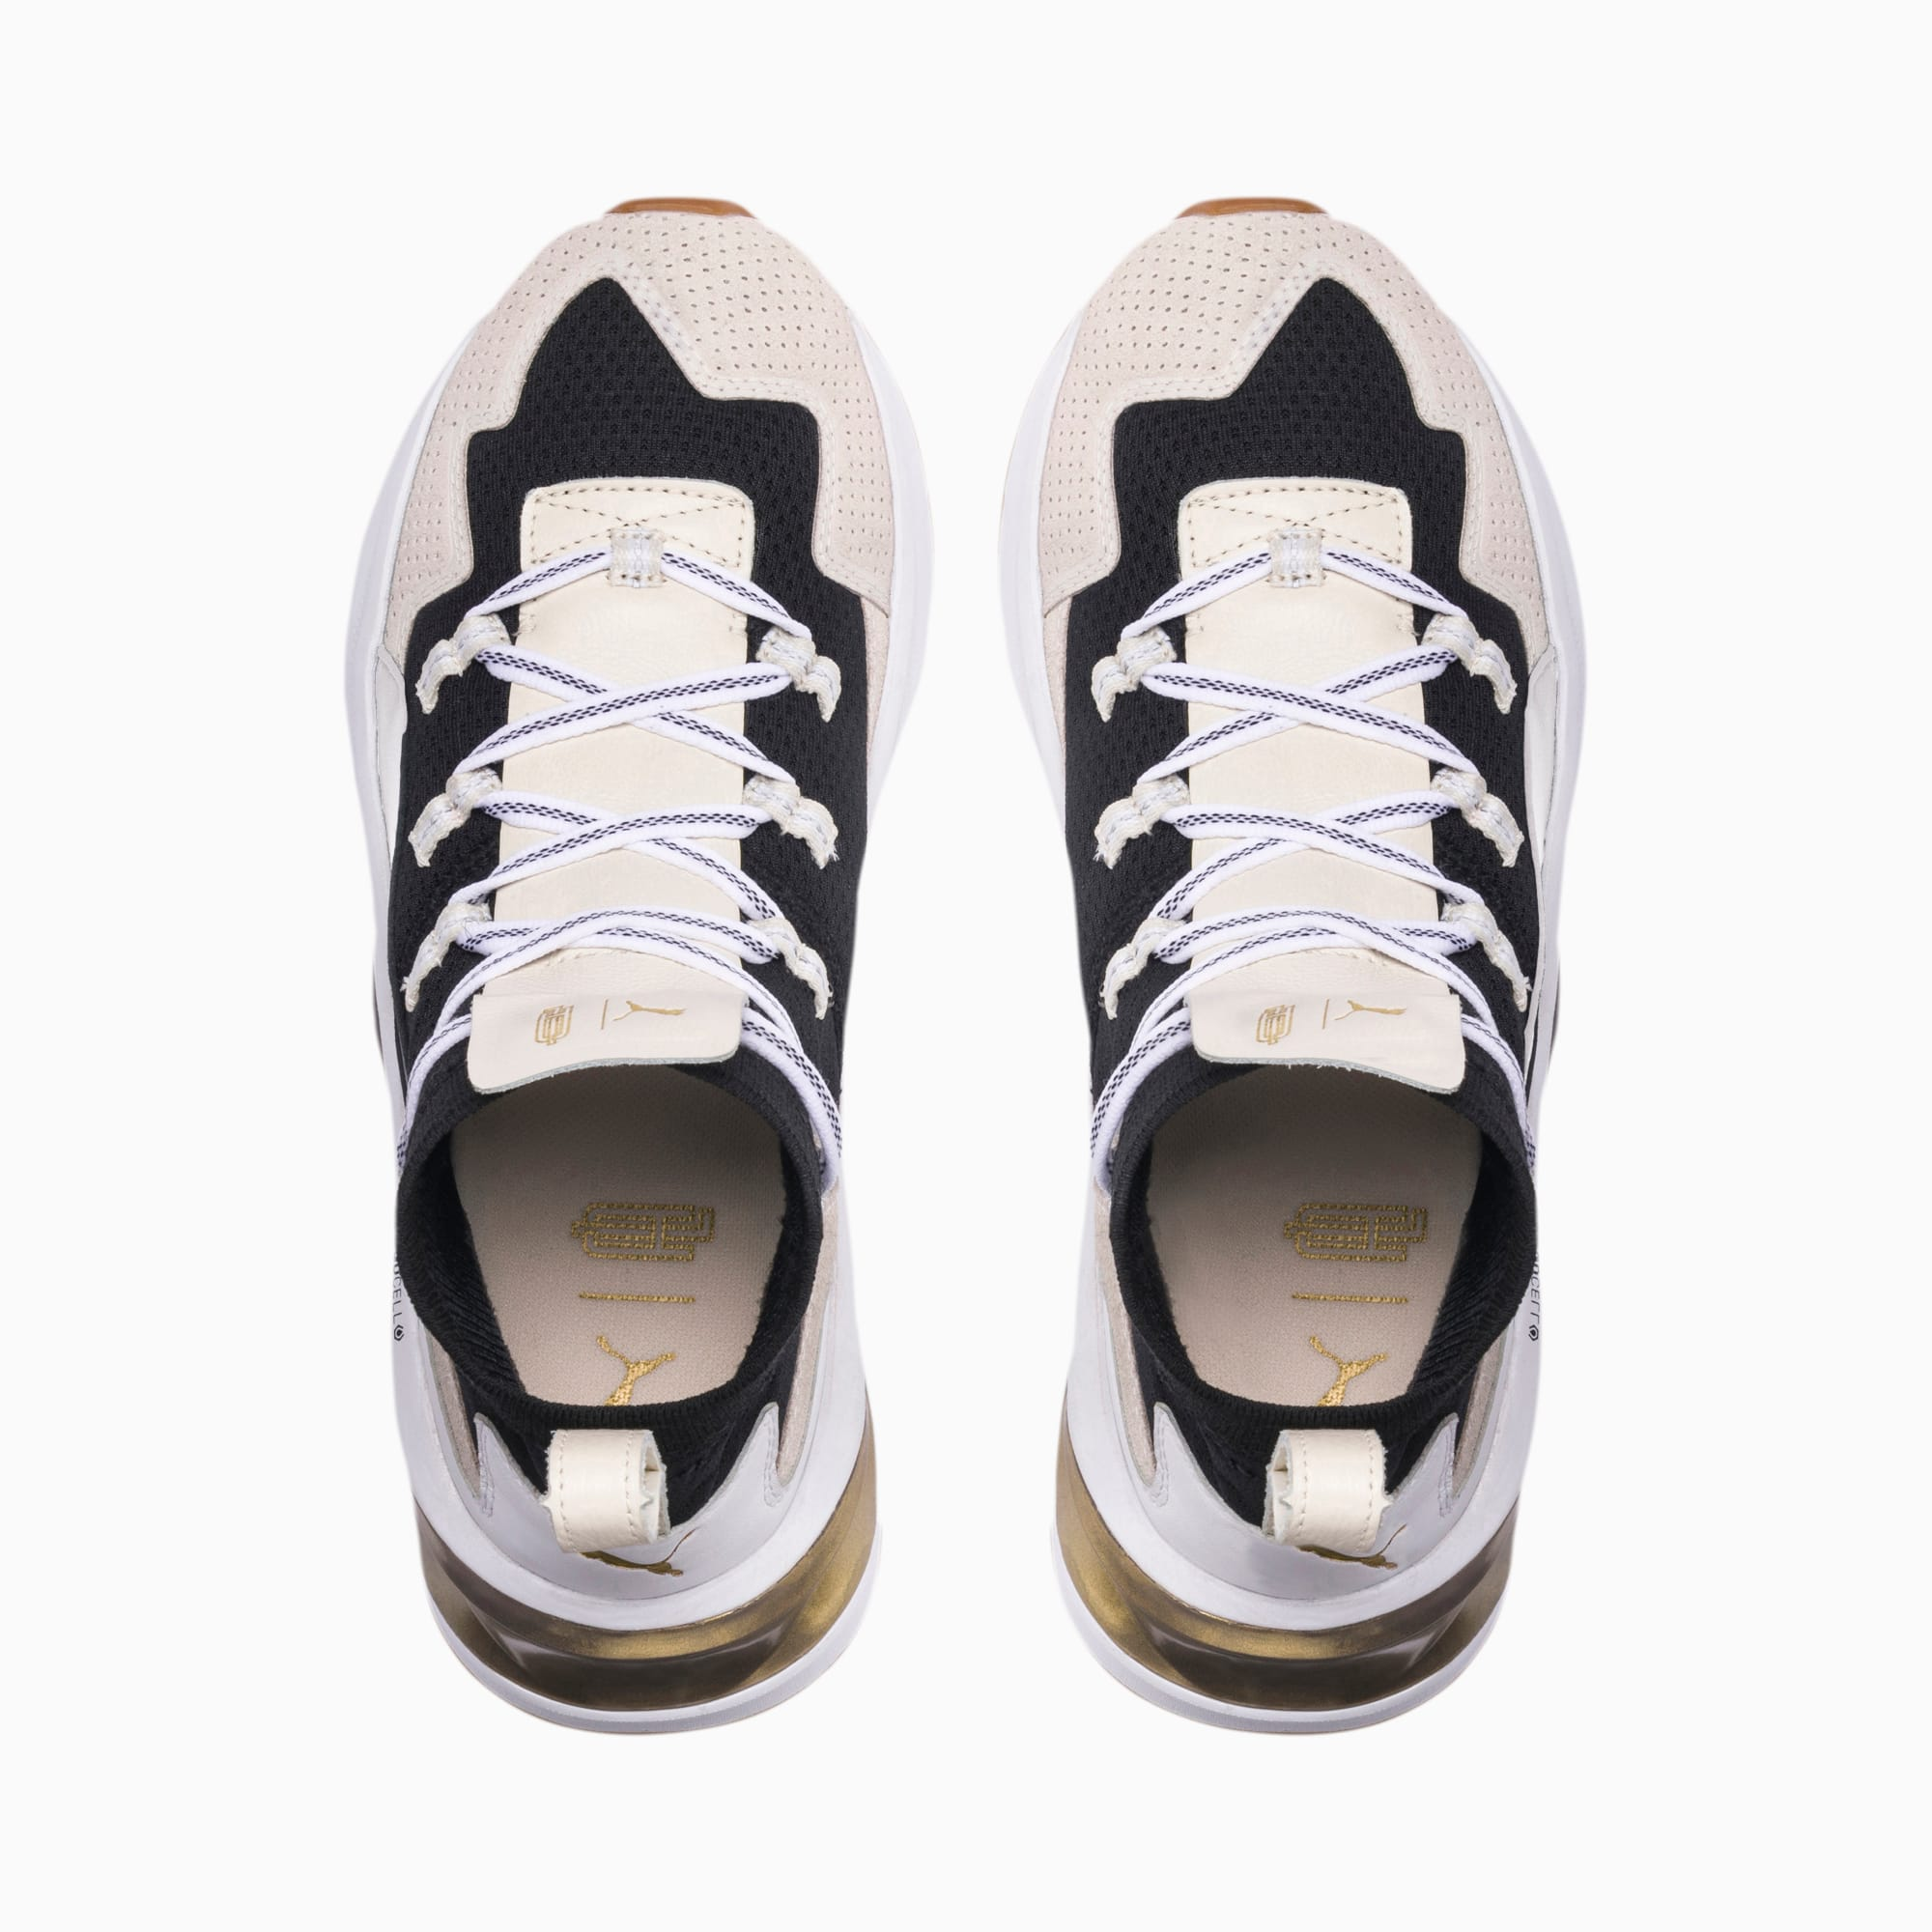 AL x PUMA LQDCELL Shatter XT Leather Womens Training Shoes